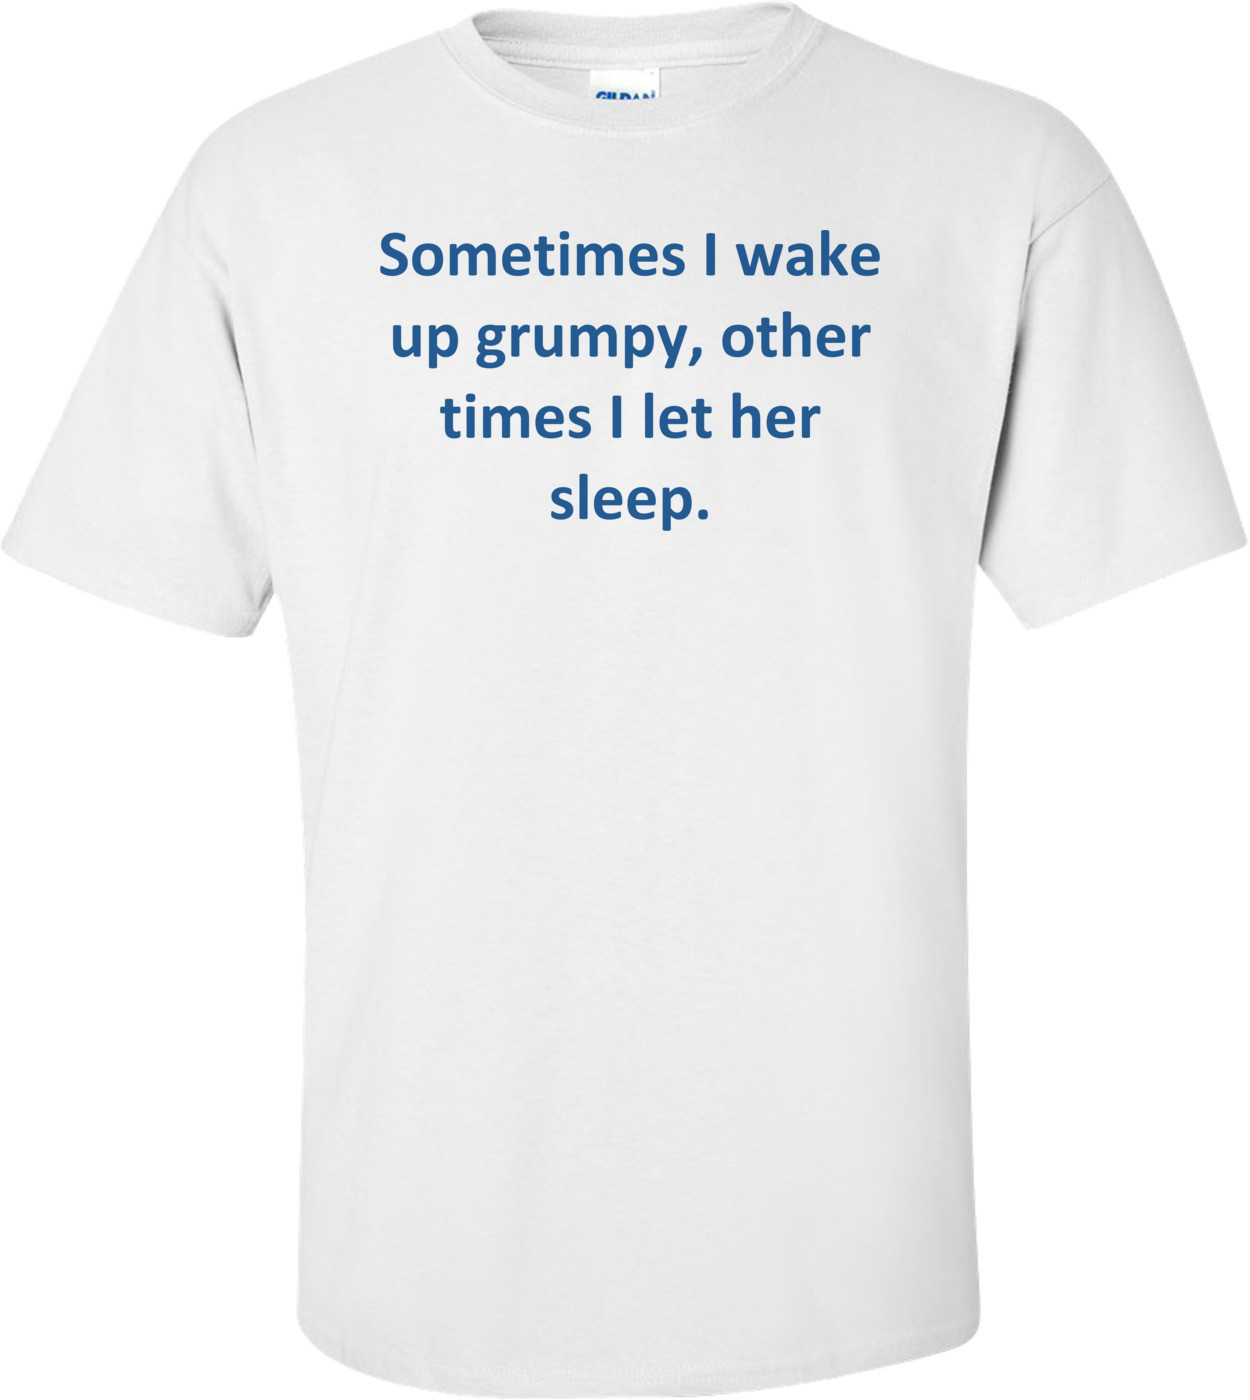 Sometimes I wake up grumpy, other times I let her sleep. Shirt